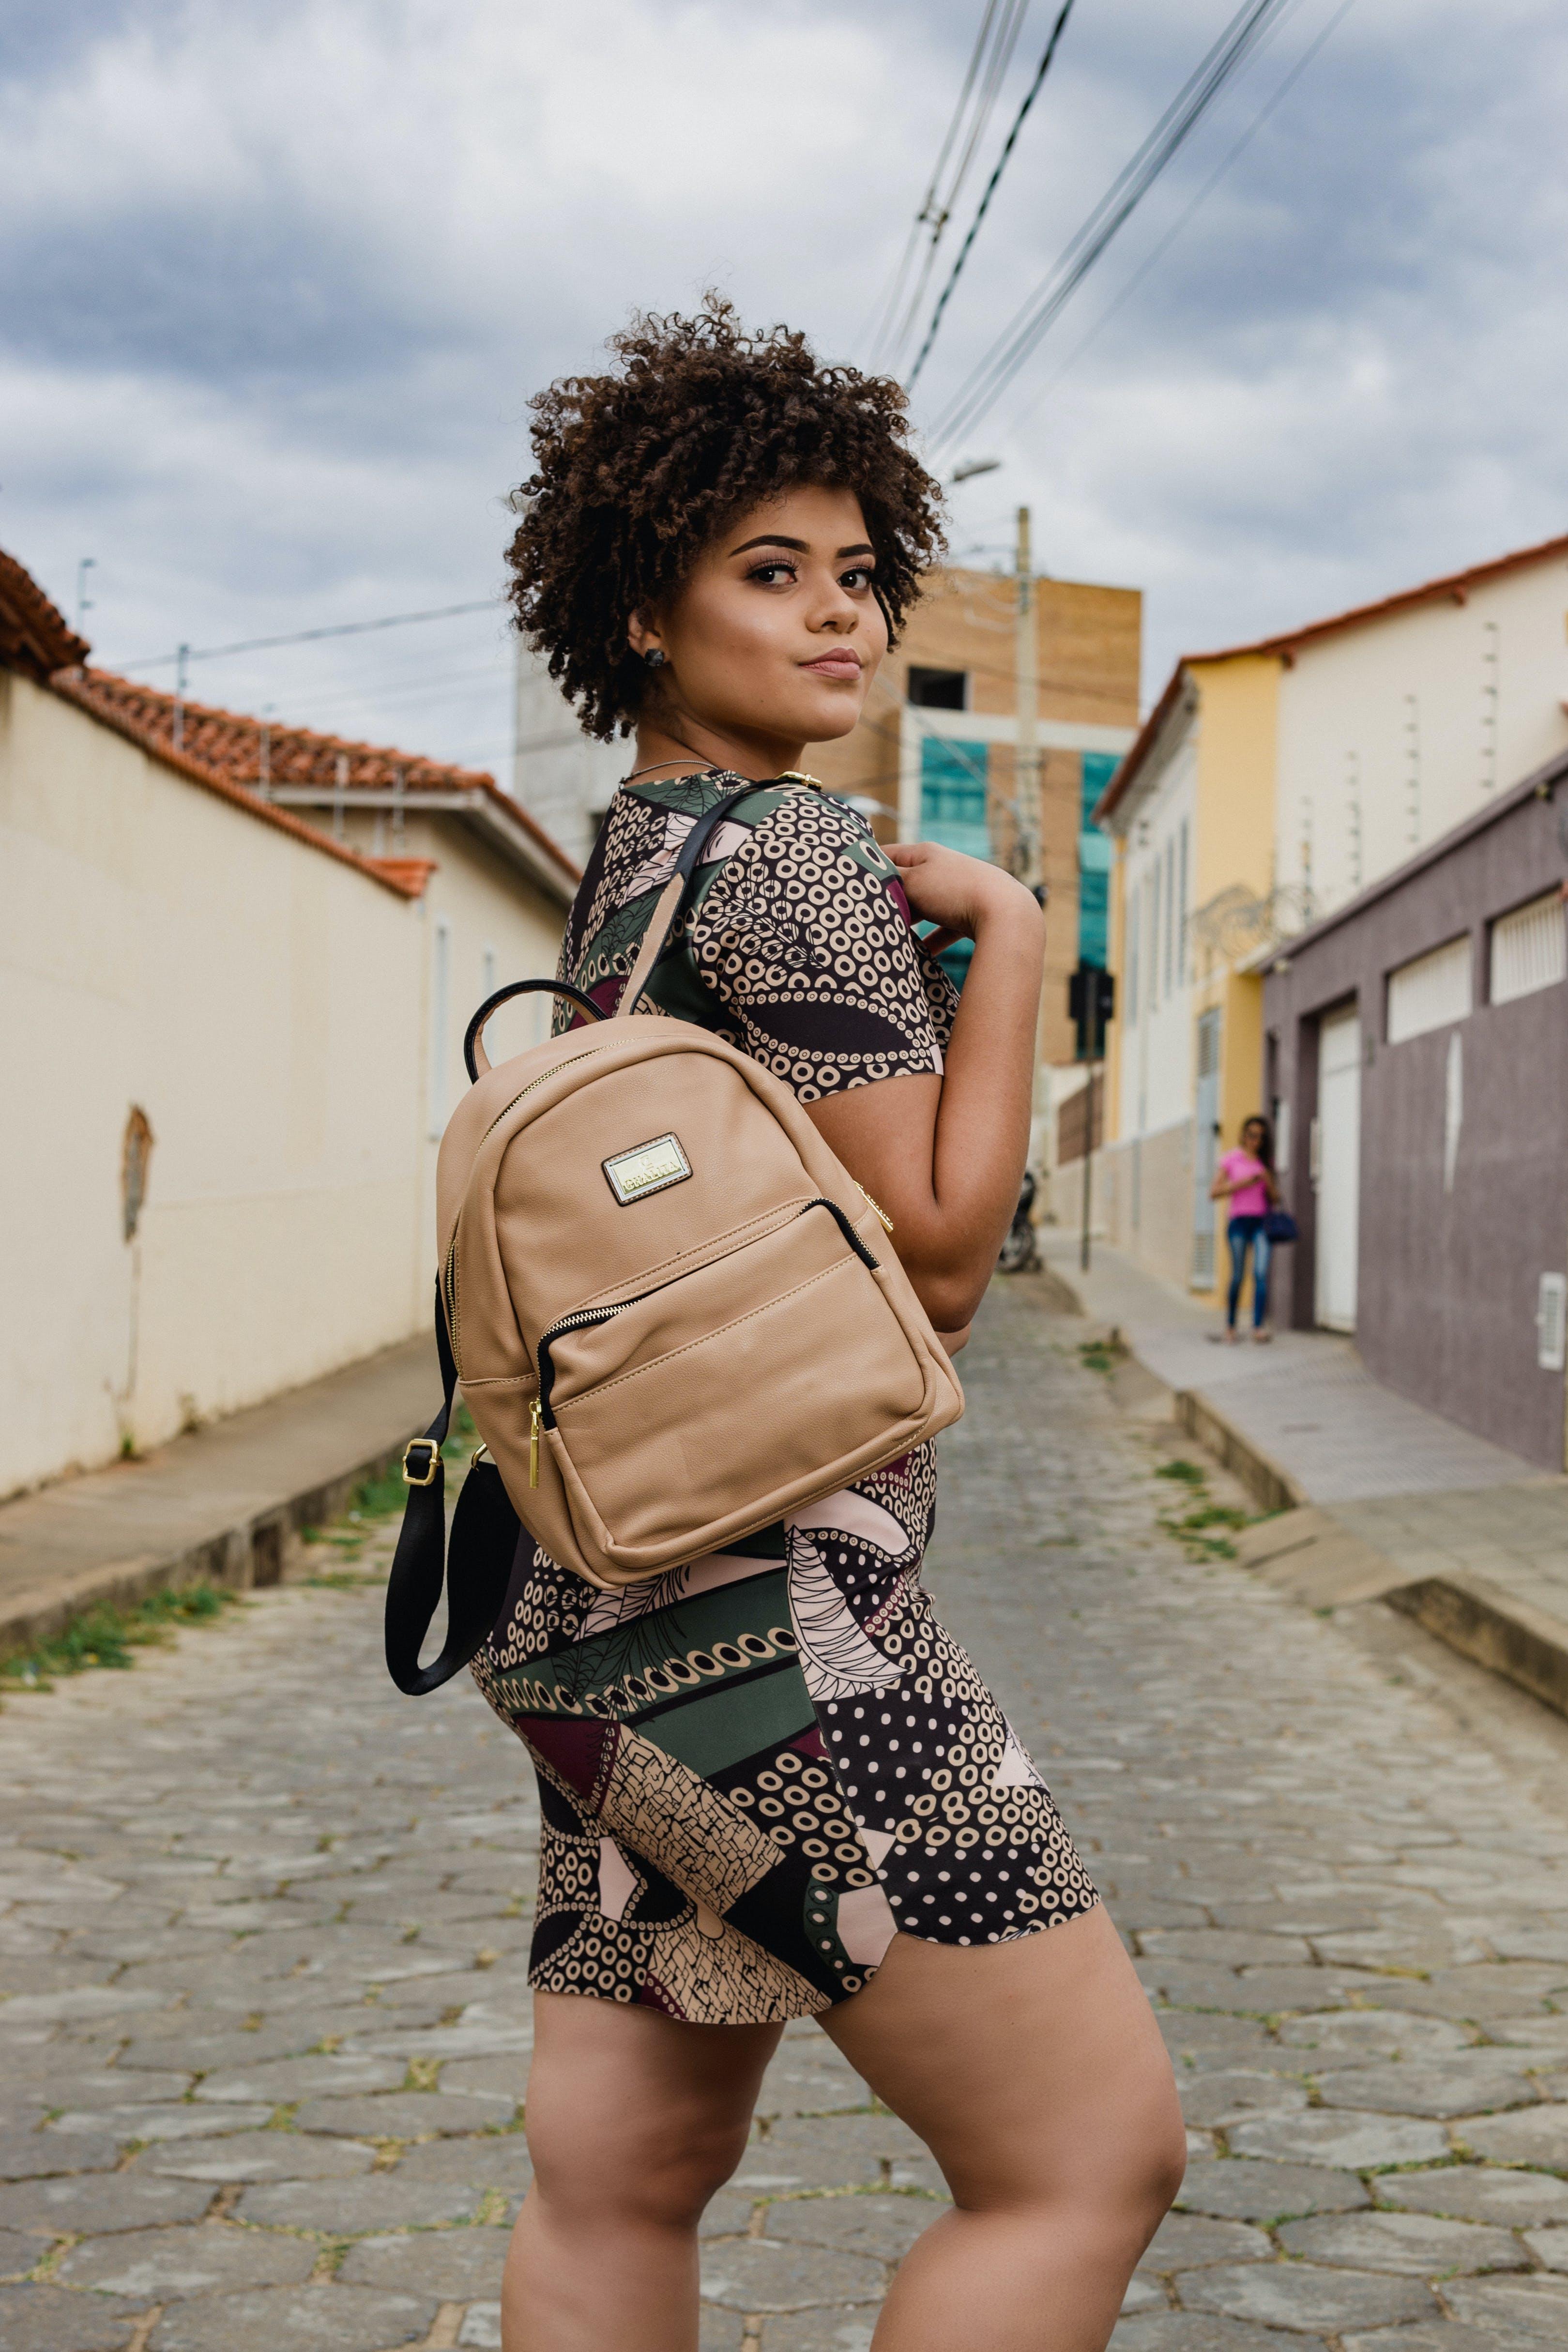 Free stock photo of fashion, person, woman, street